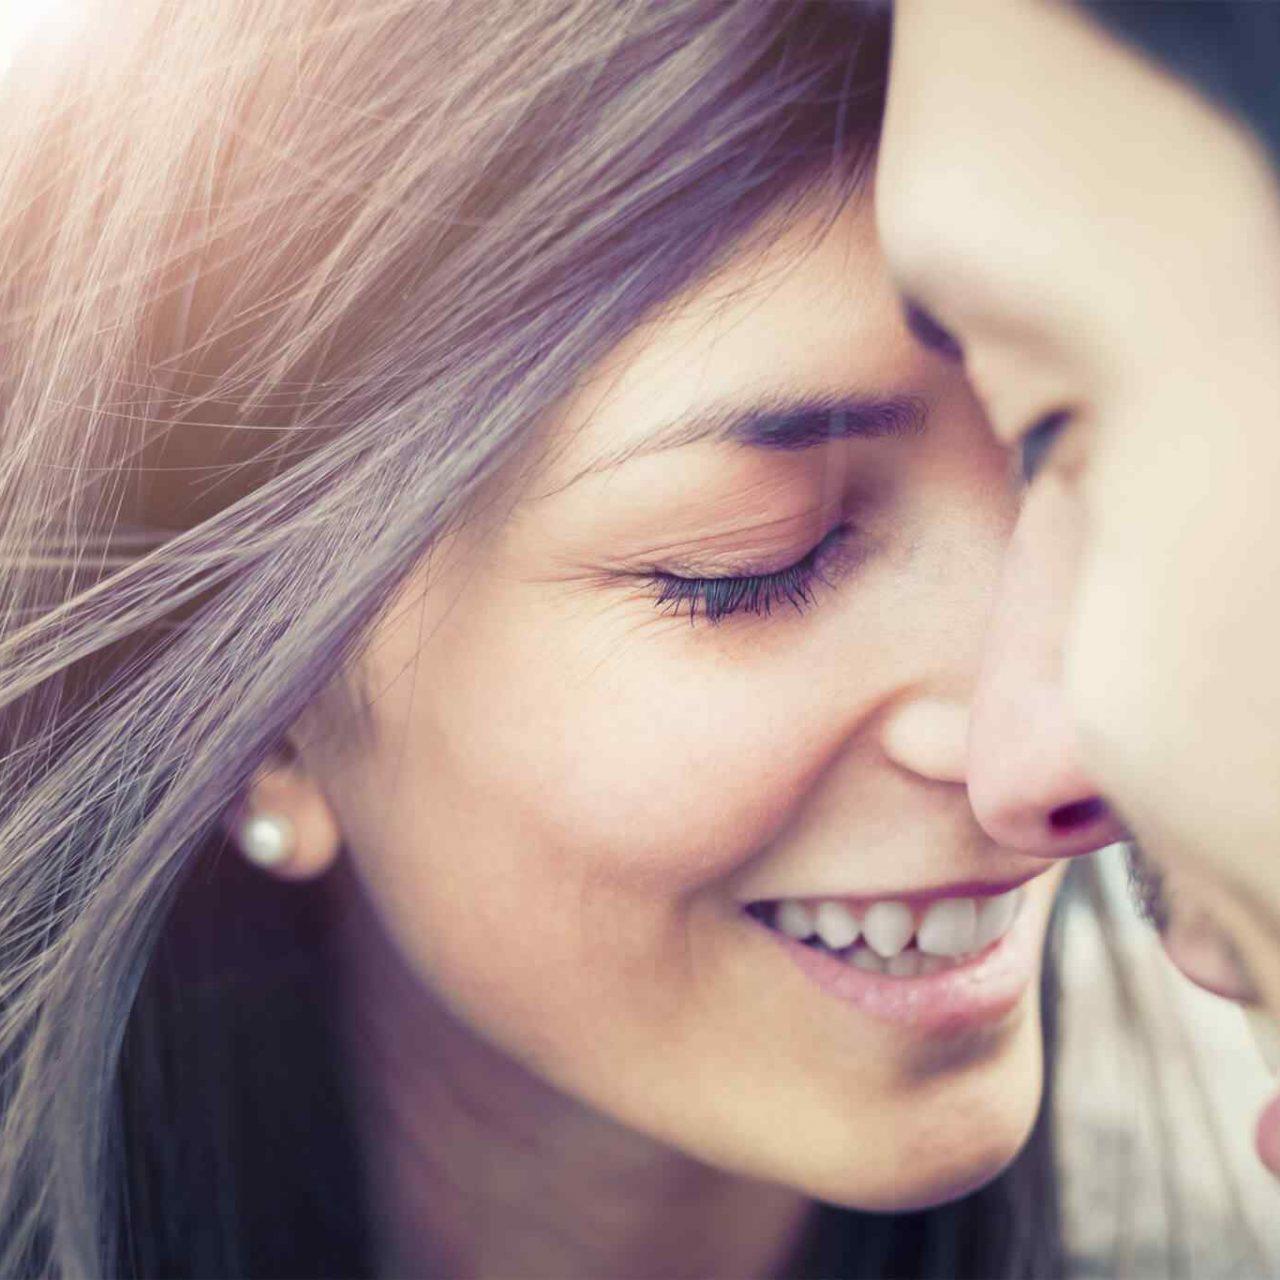 https://mirelasula.com/wp-content/uploads/2018/01/img-class-marriage-01-1280x1280.jpg